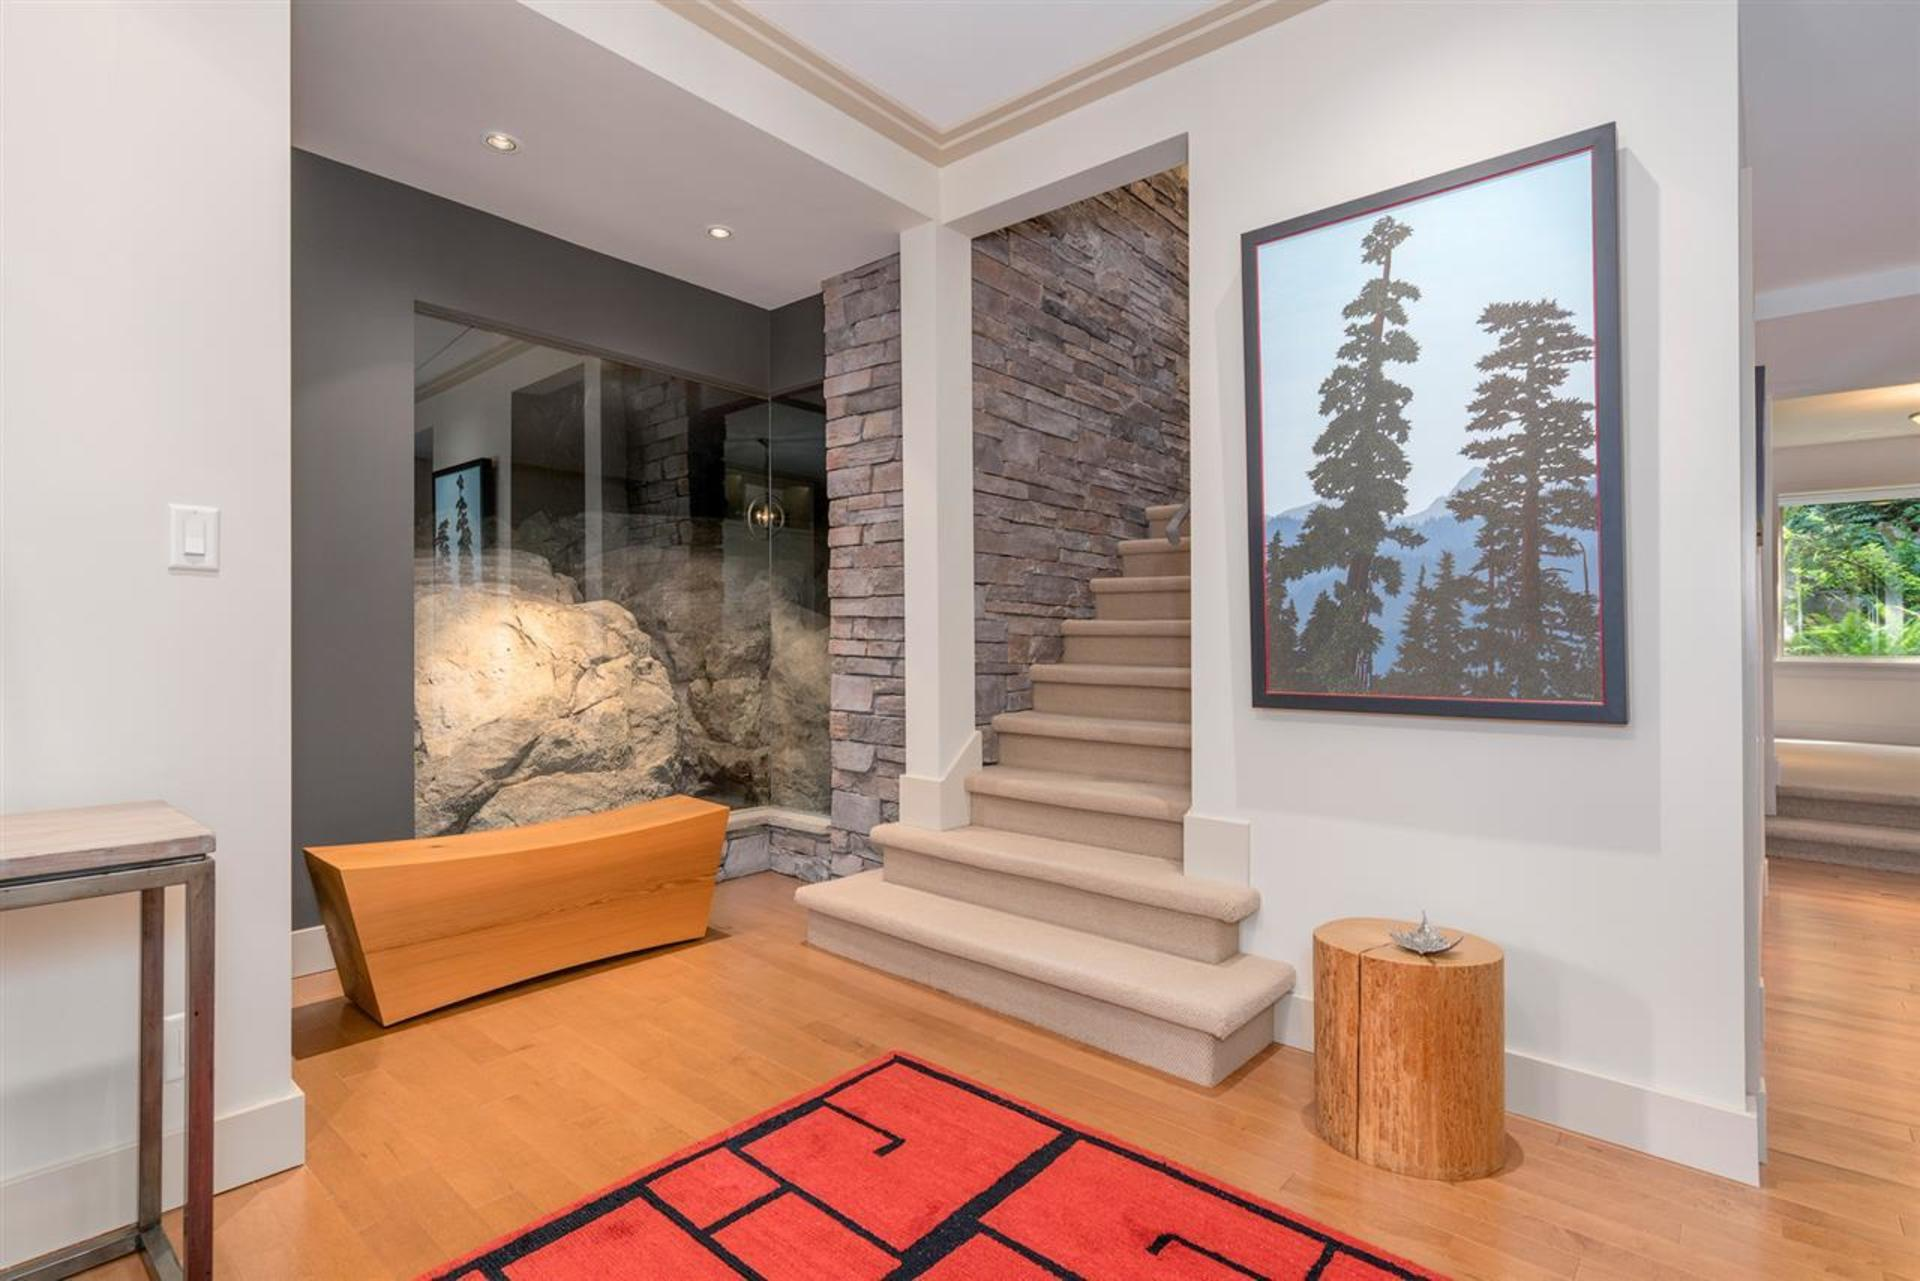 4620-woodburn-road-cypress-park-estates-west-vancouver-06 at 4620 Woodburn Road, Cypress Park Estates, West Vancouver